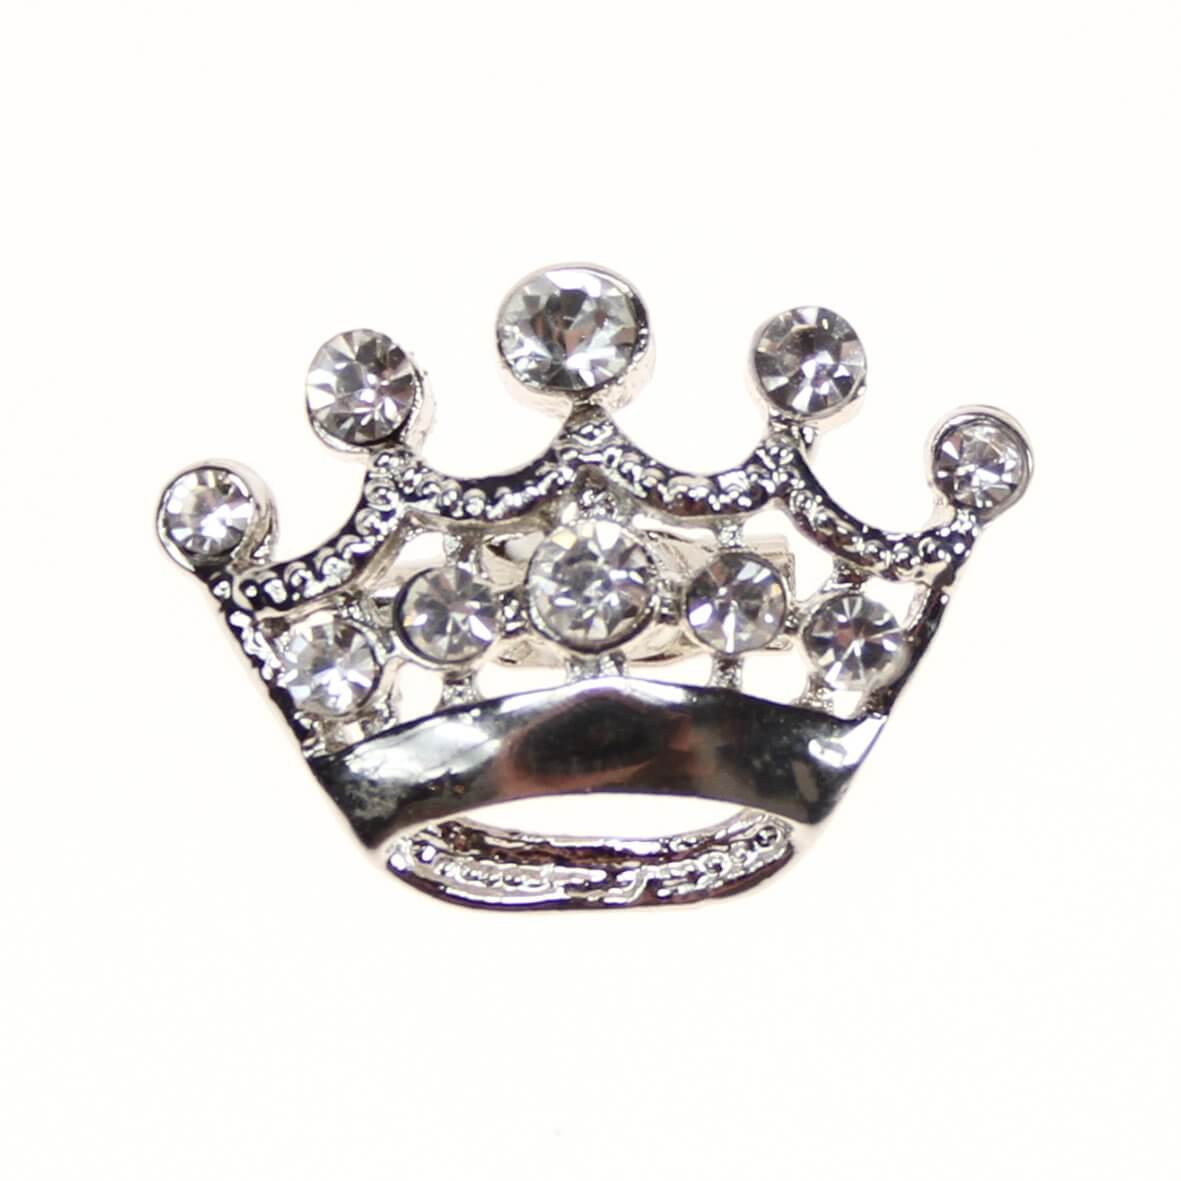 Minuet Crown (Embellishment) - a crown shaped diamante embellishment